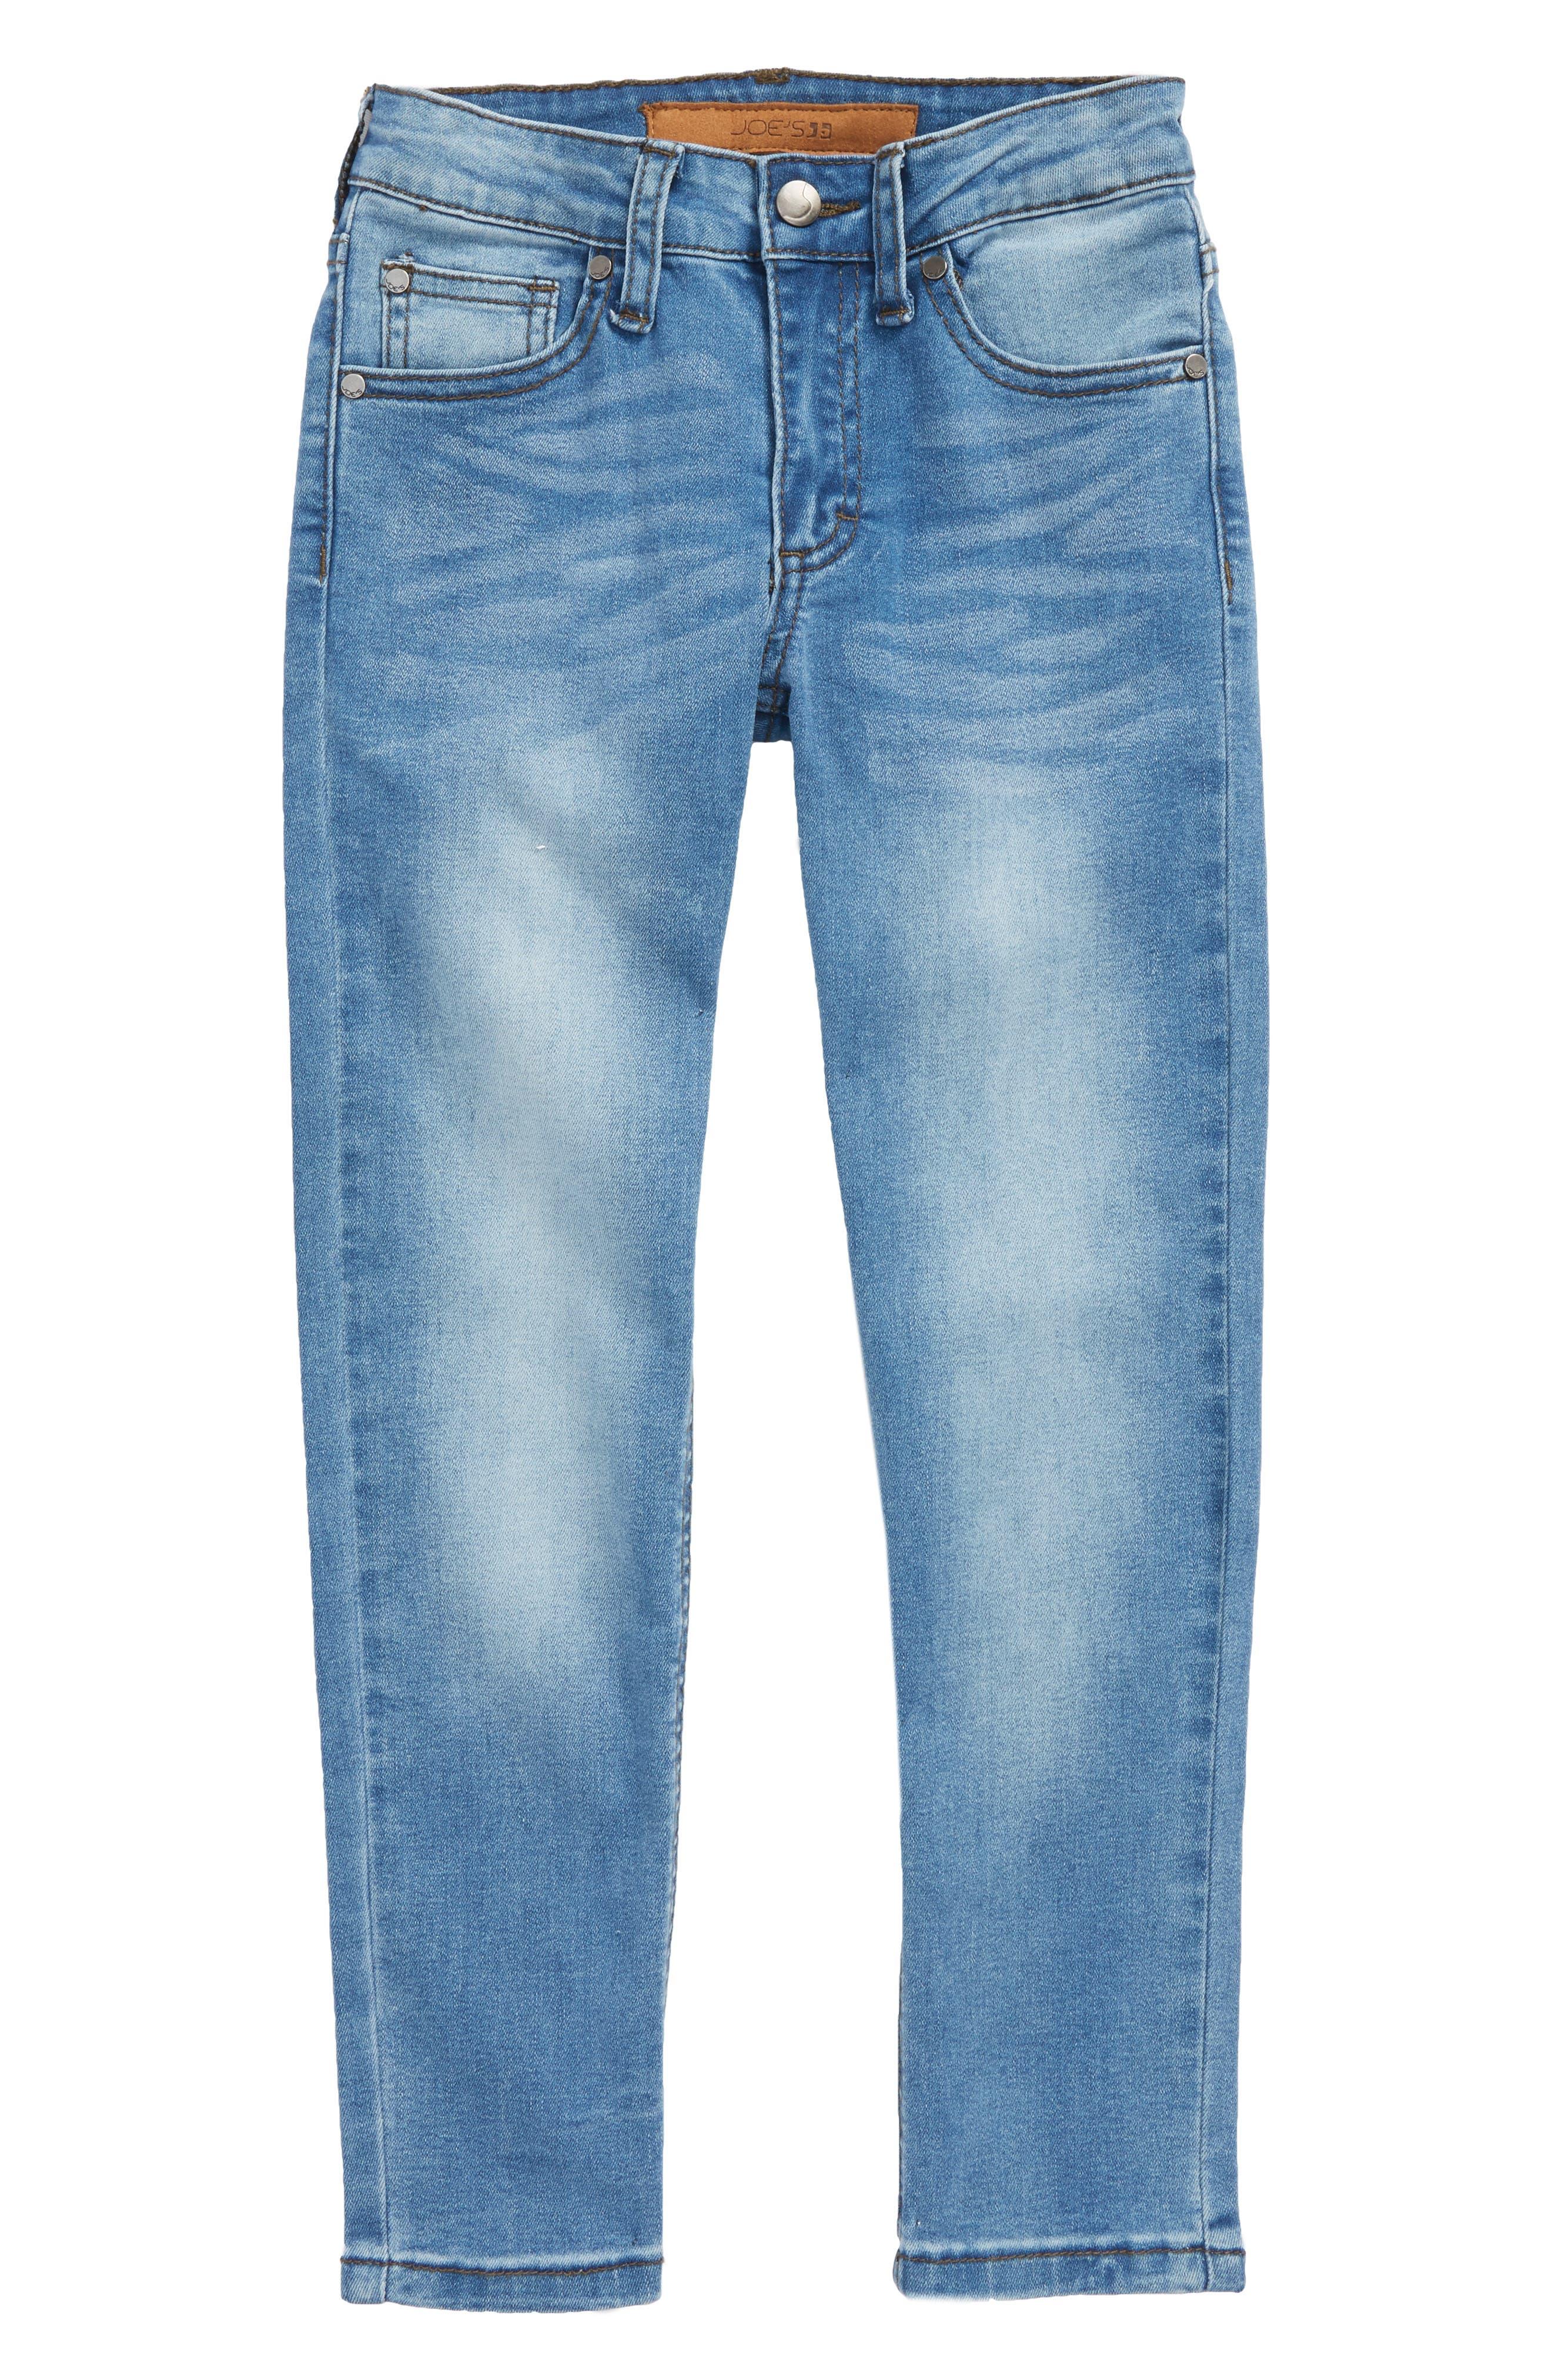 Main Image - Joe's Rad Slim Fit Stretch Jeans (Toddler Boys & Little Boys)